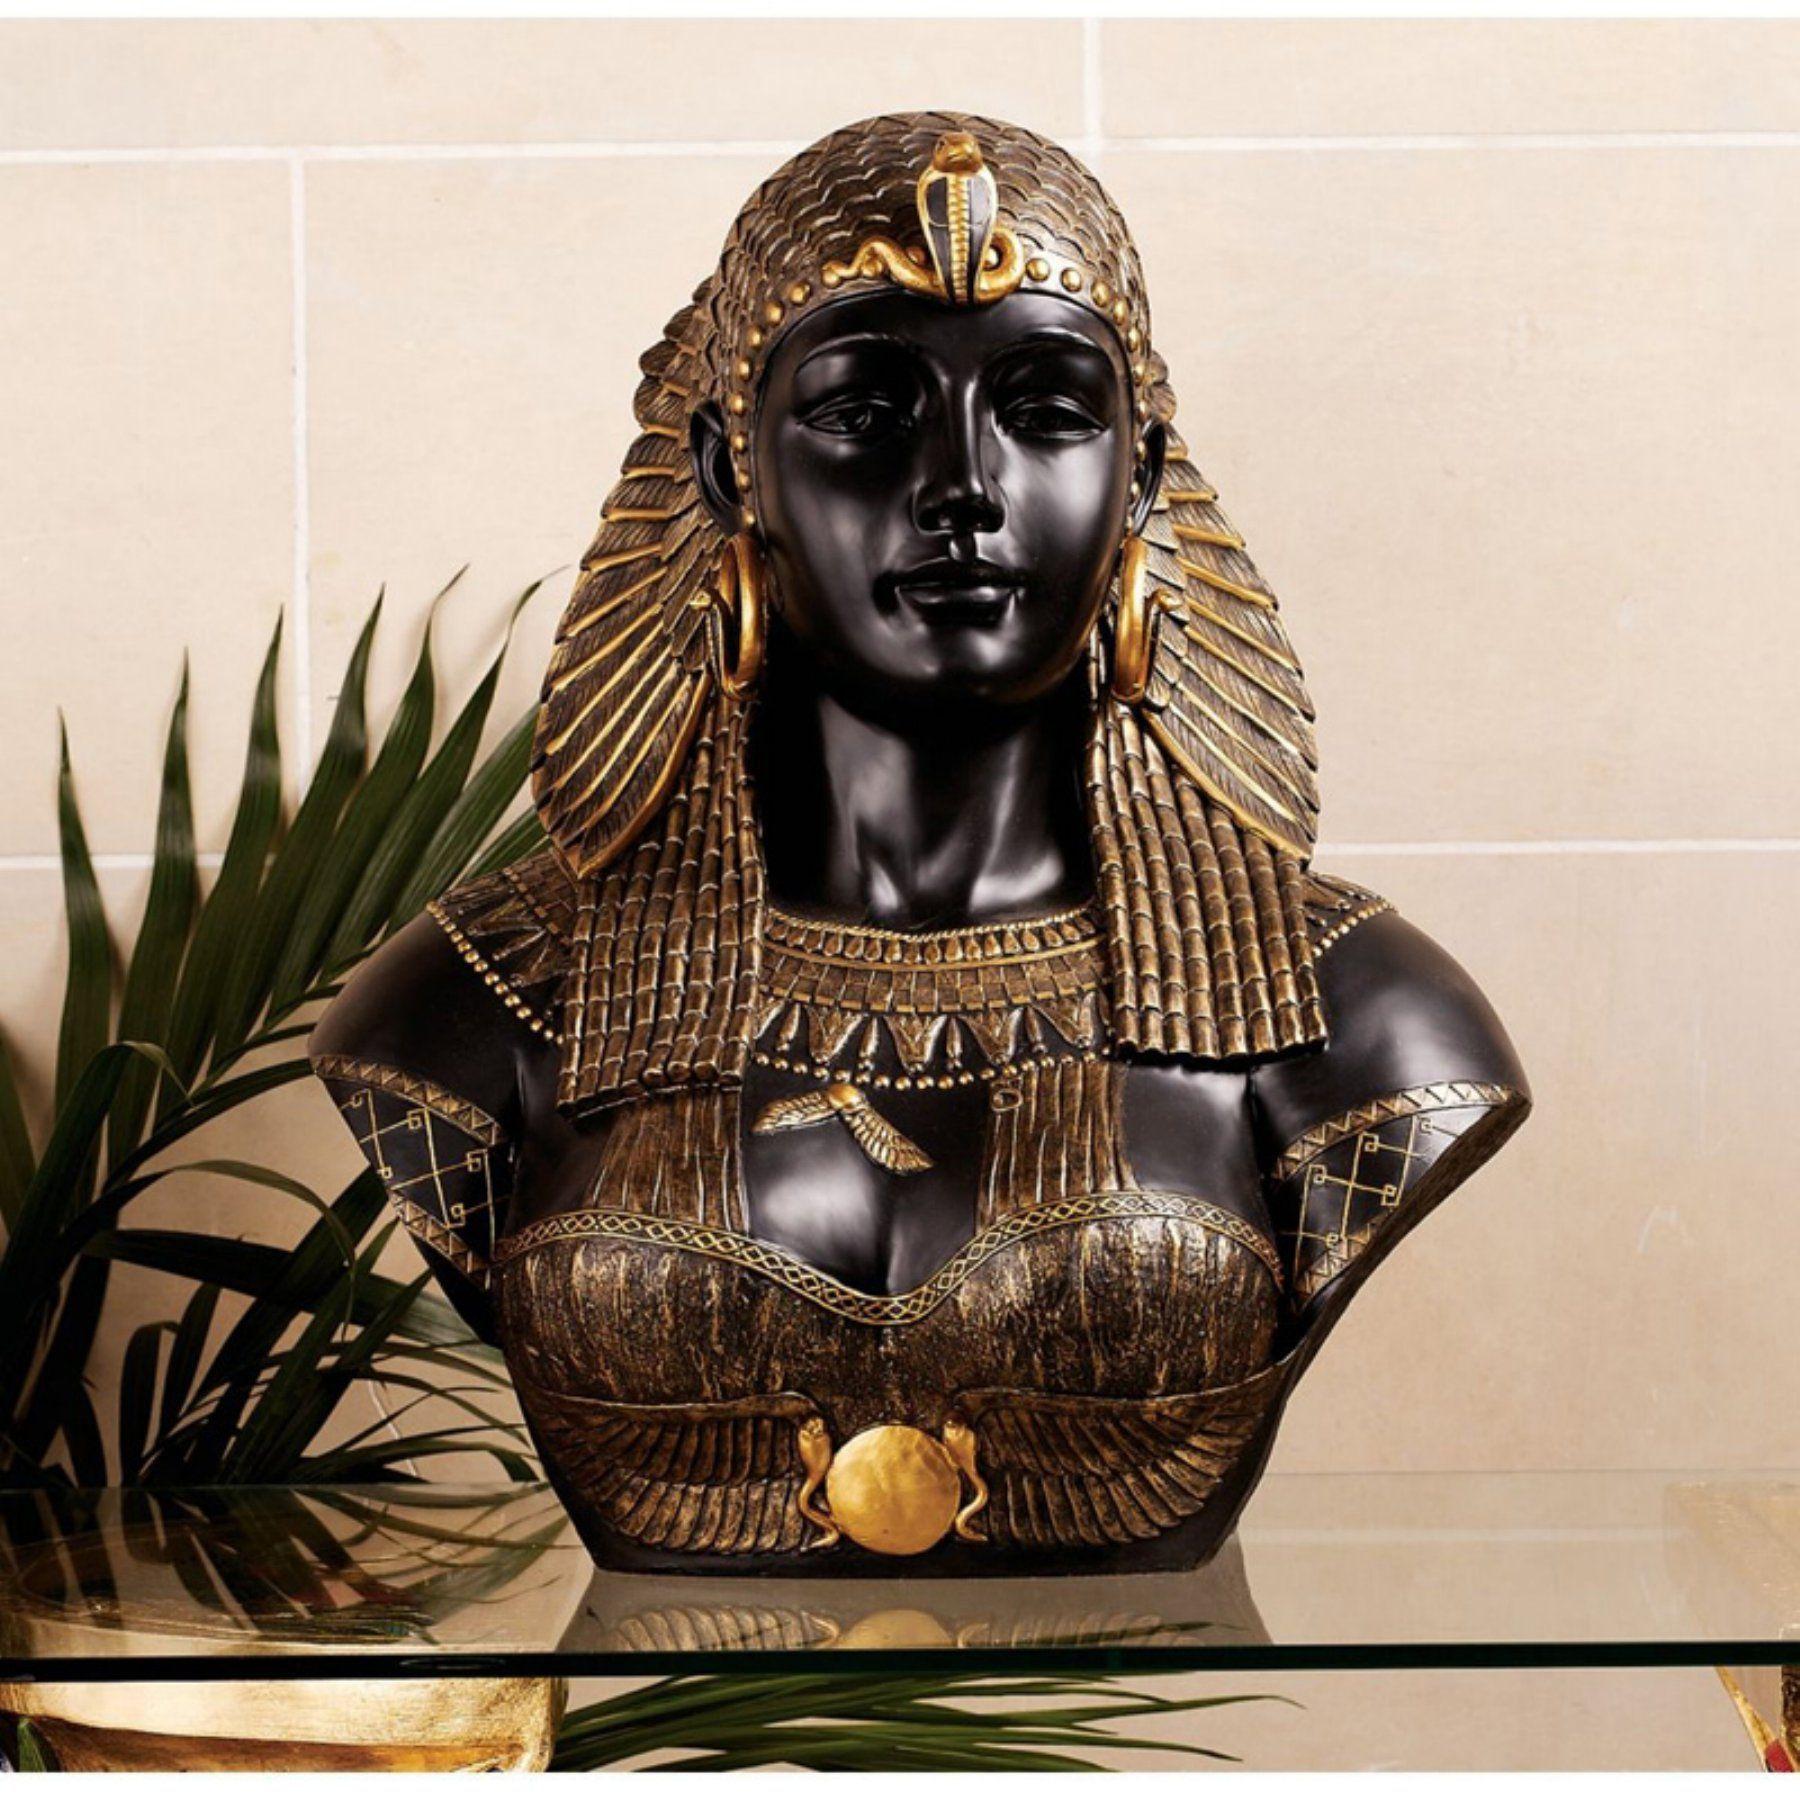 Design Toscano 21 in. Queen Cleopatra Neoclassical Sculptural Bust - WU71550